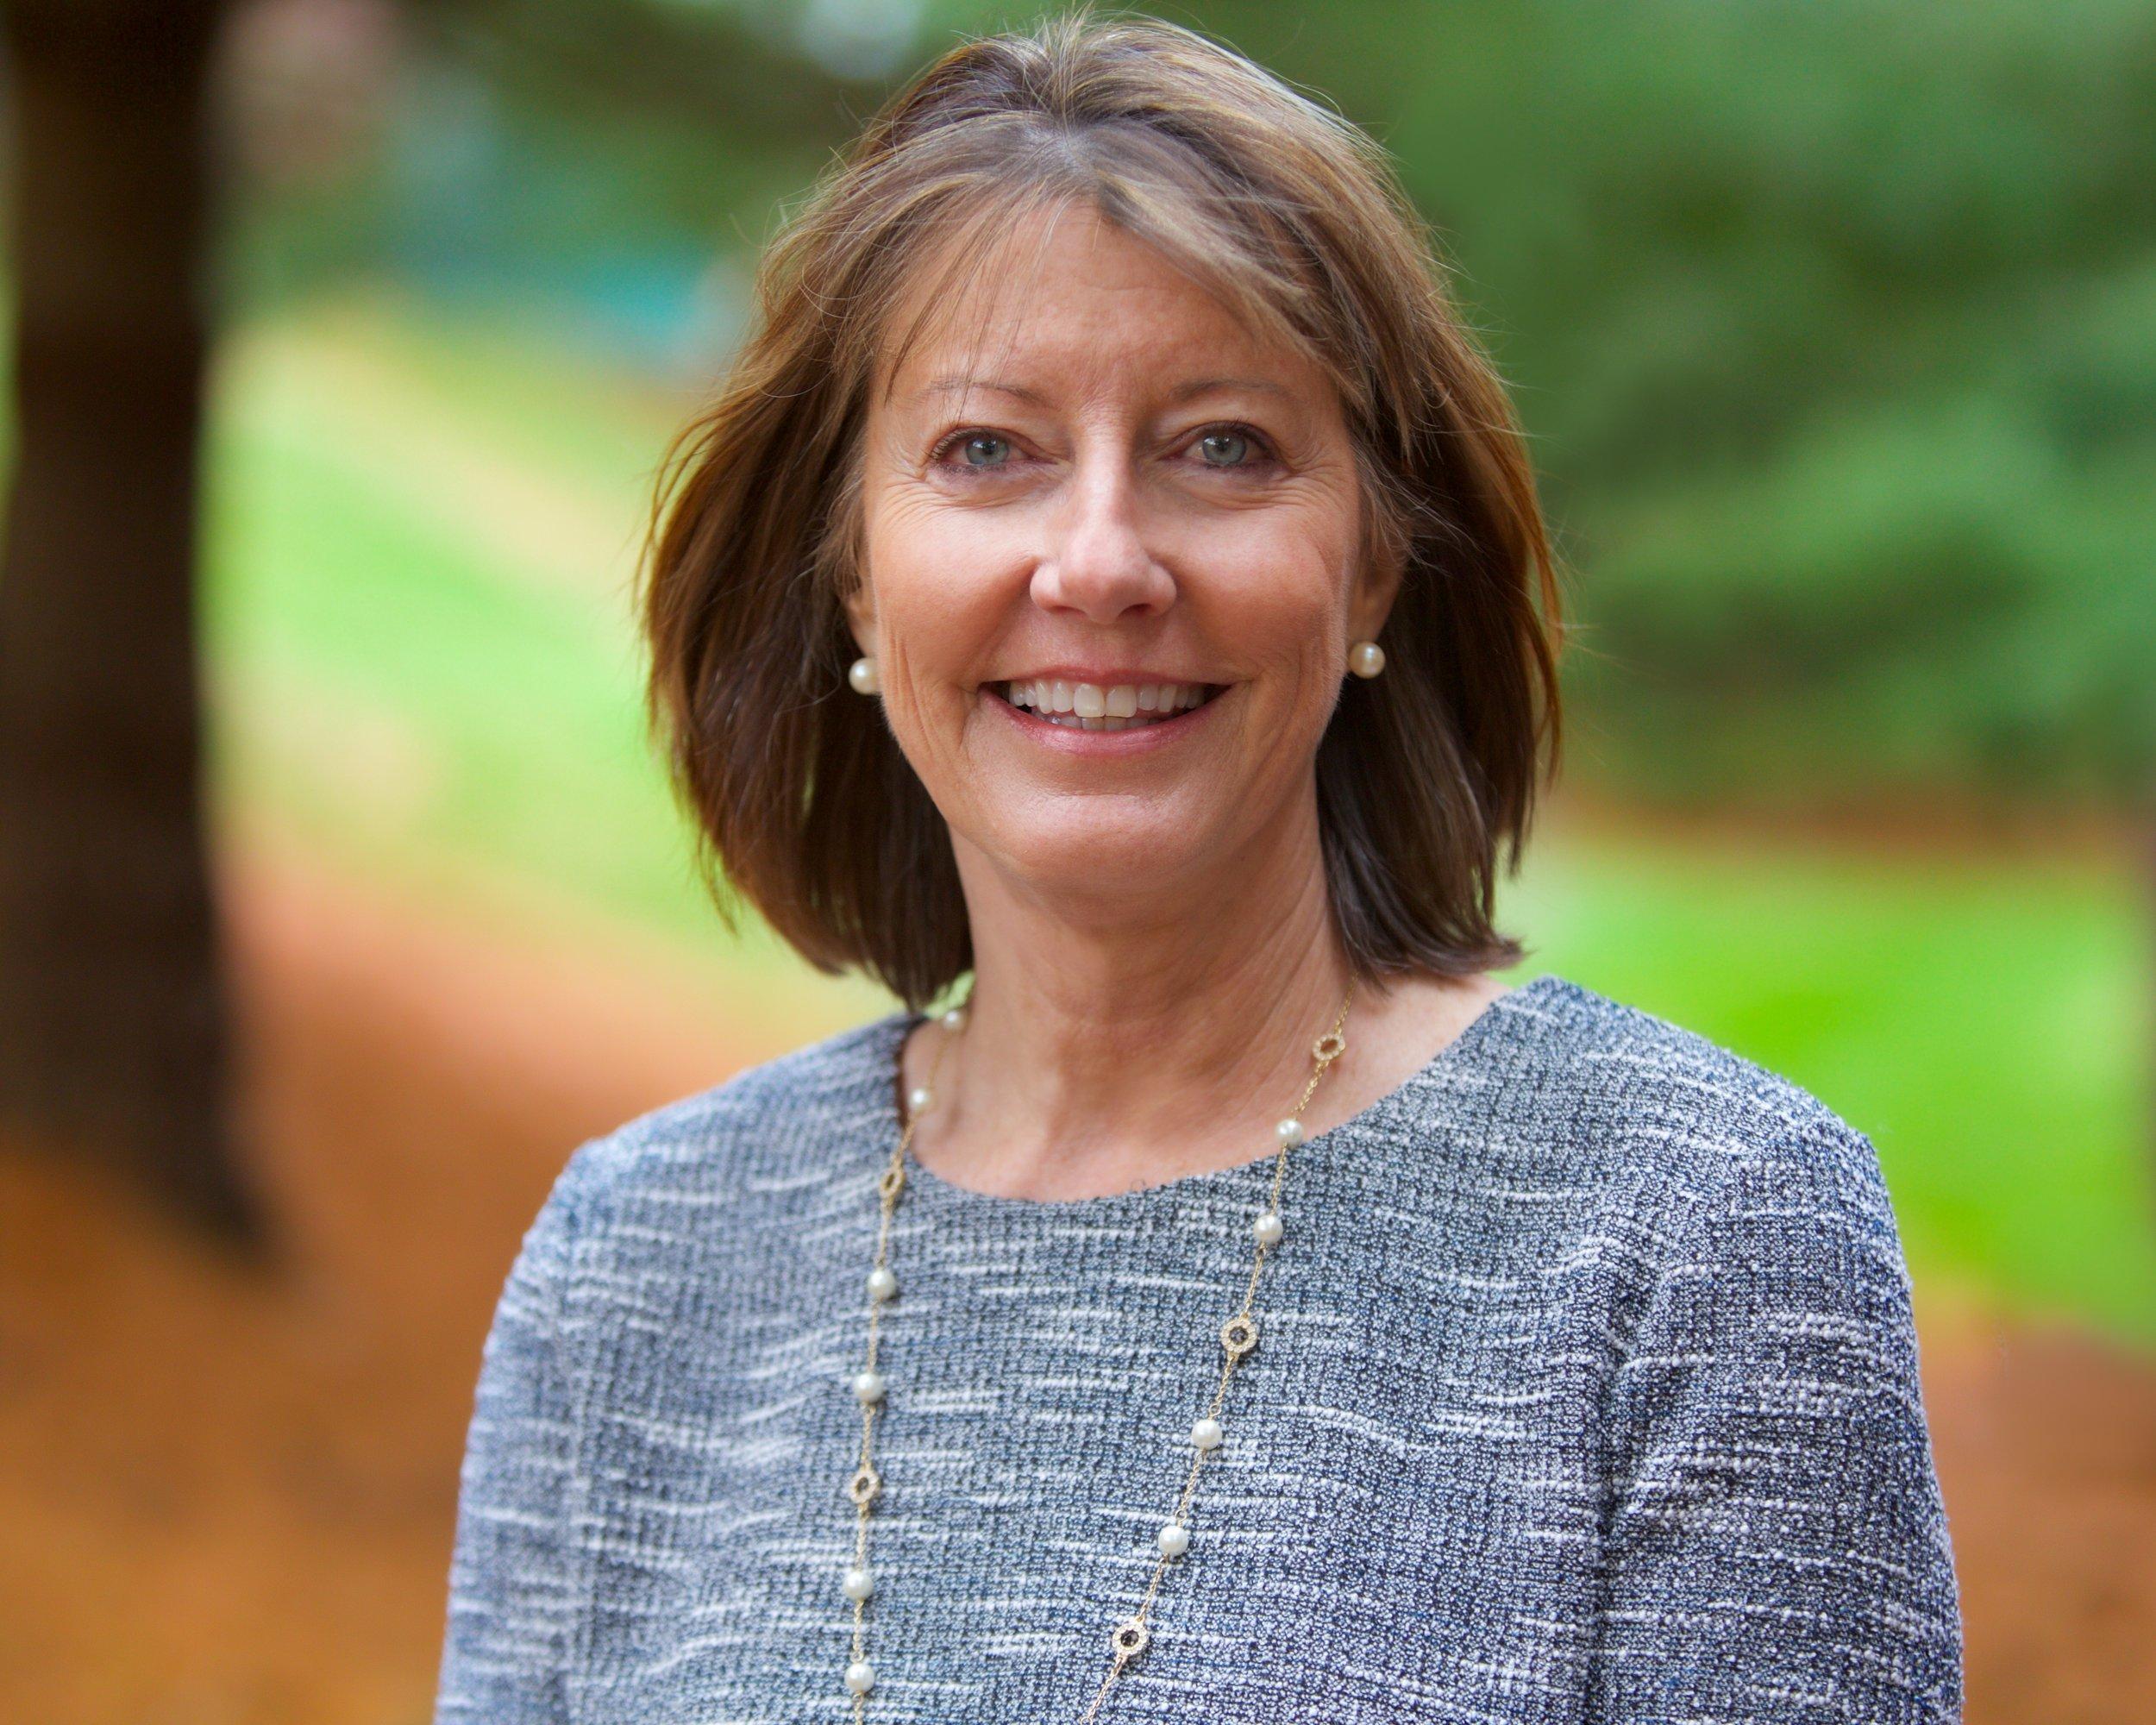 Lori Lawlor Human Resources Manager